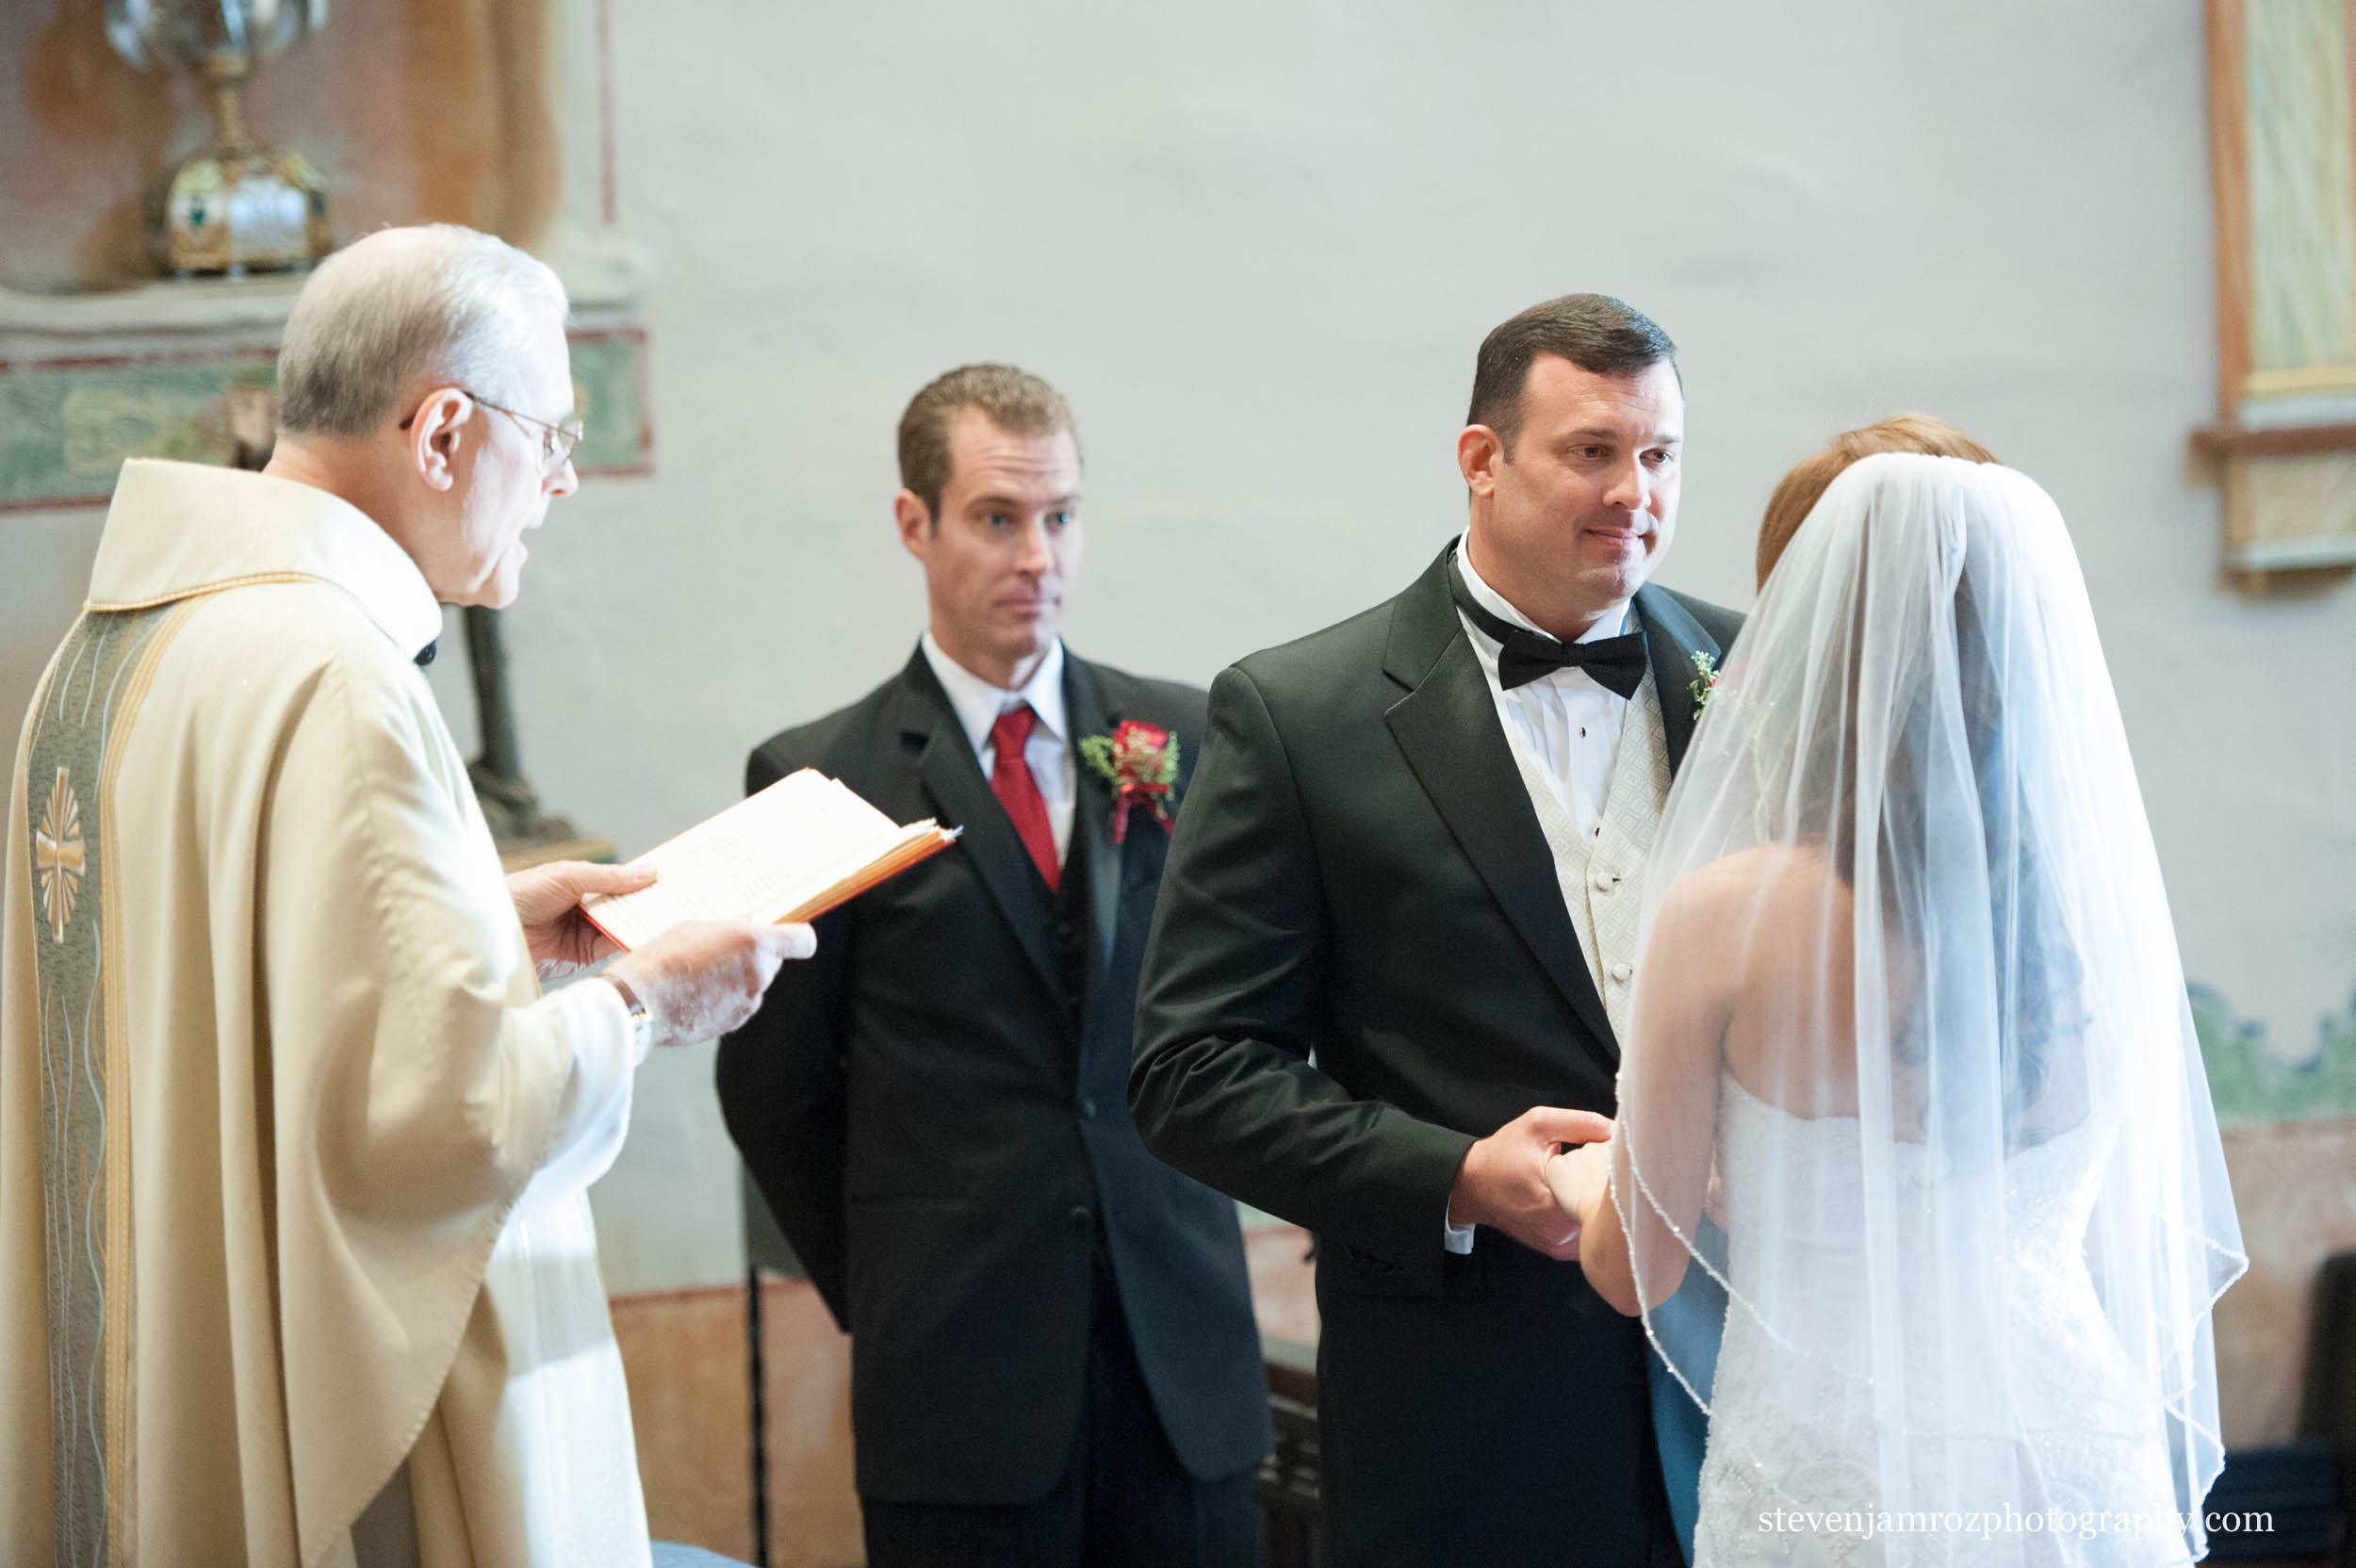 old-chapel-wedding-durham-nc-wedding-steven-jamroz-photography-0443.jpg